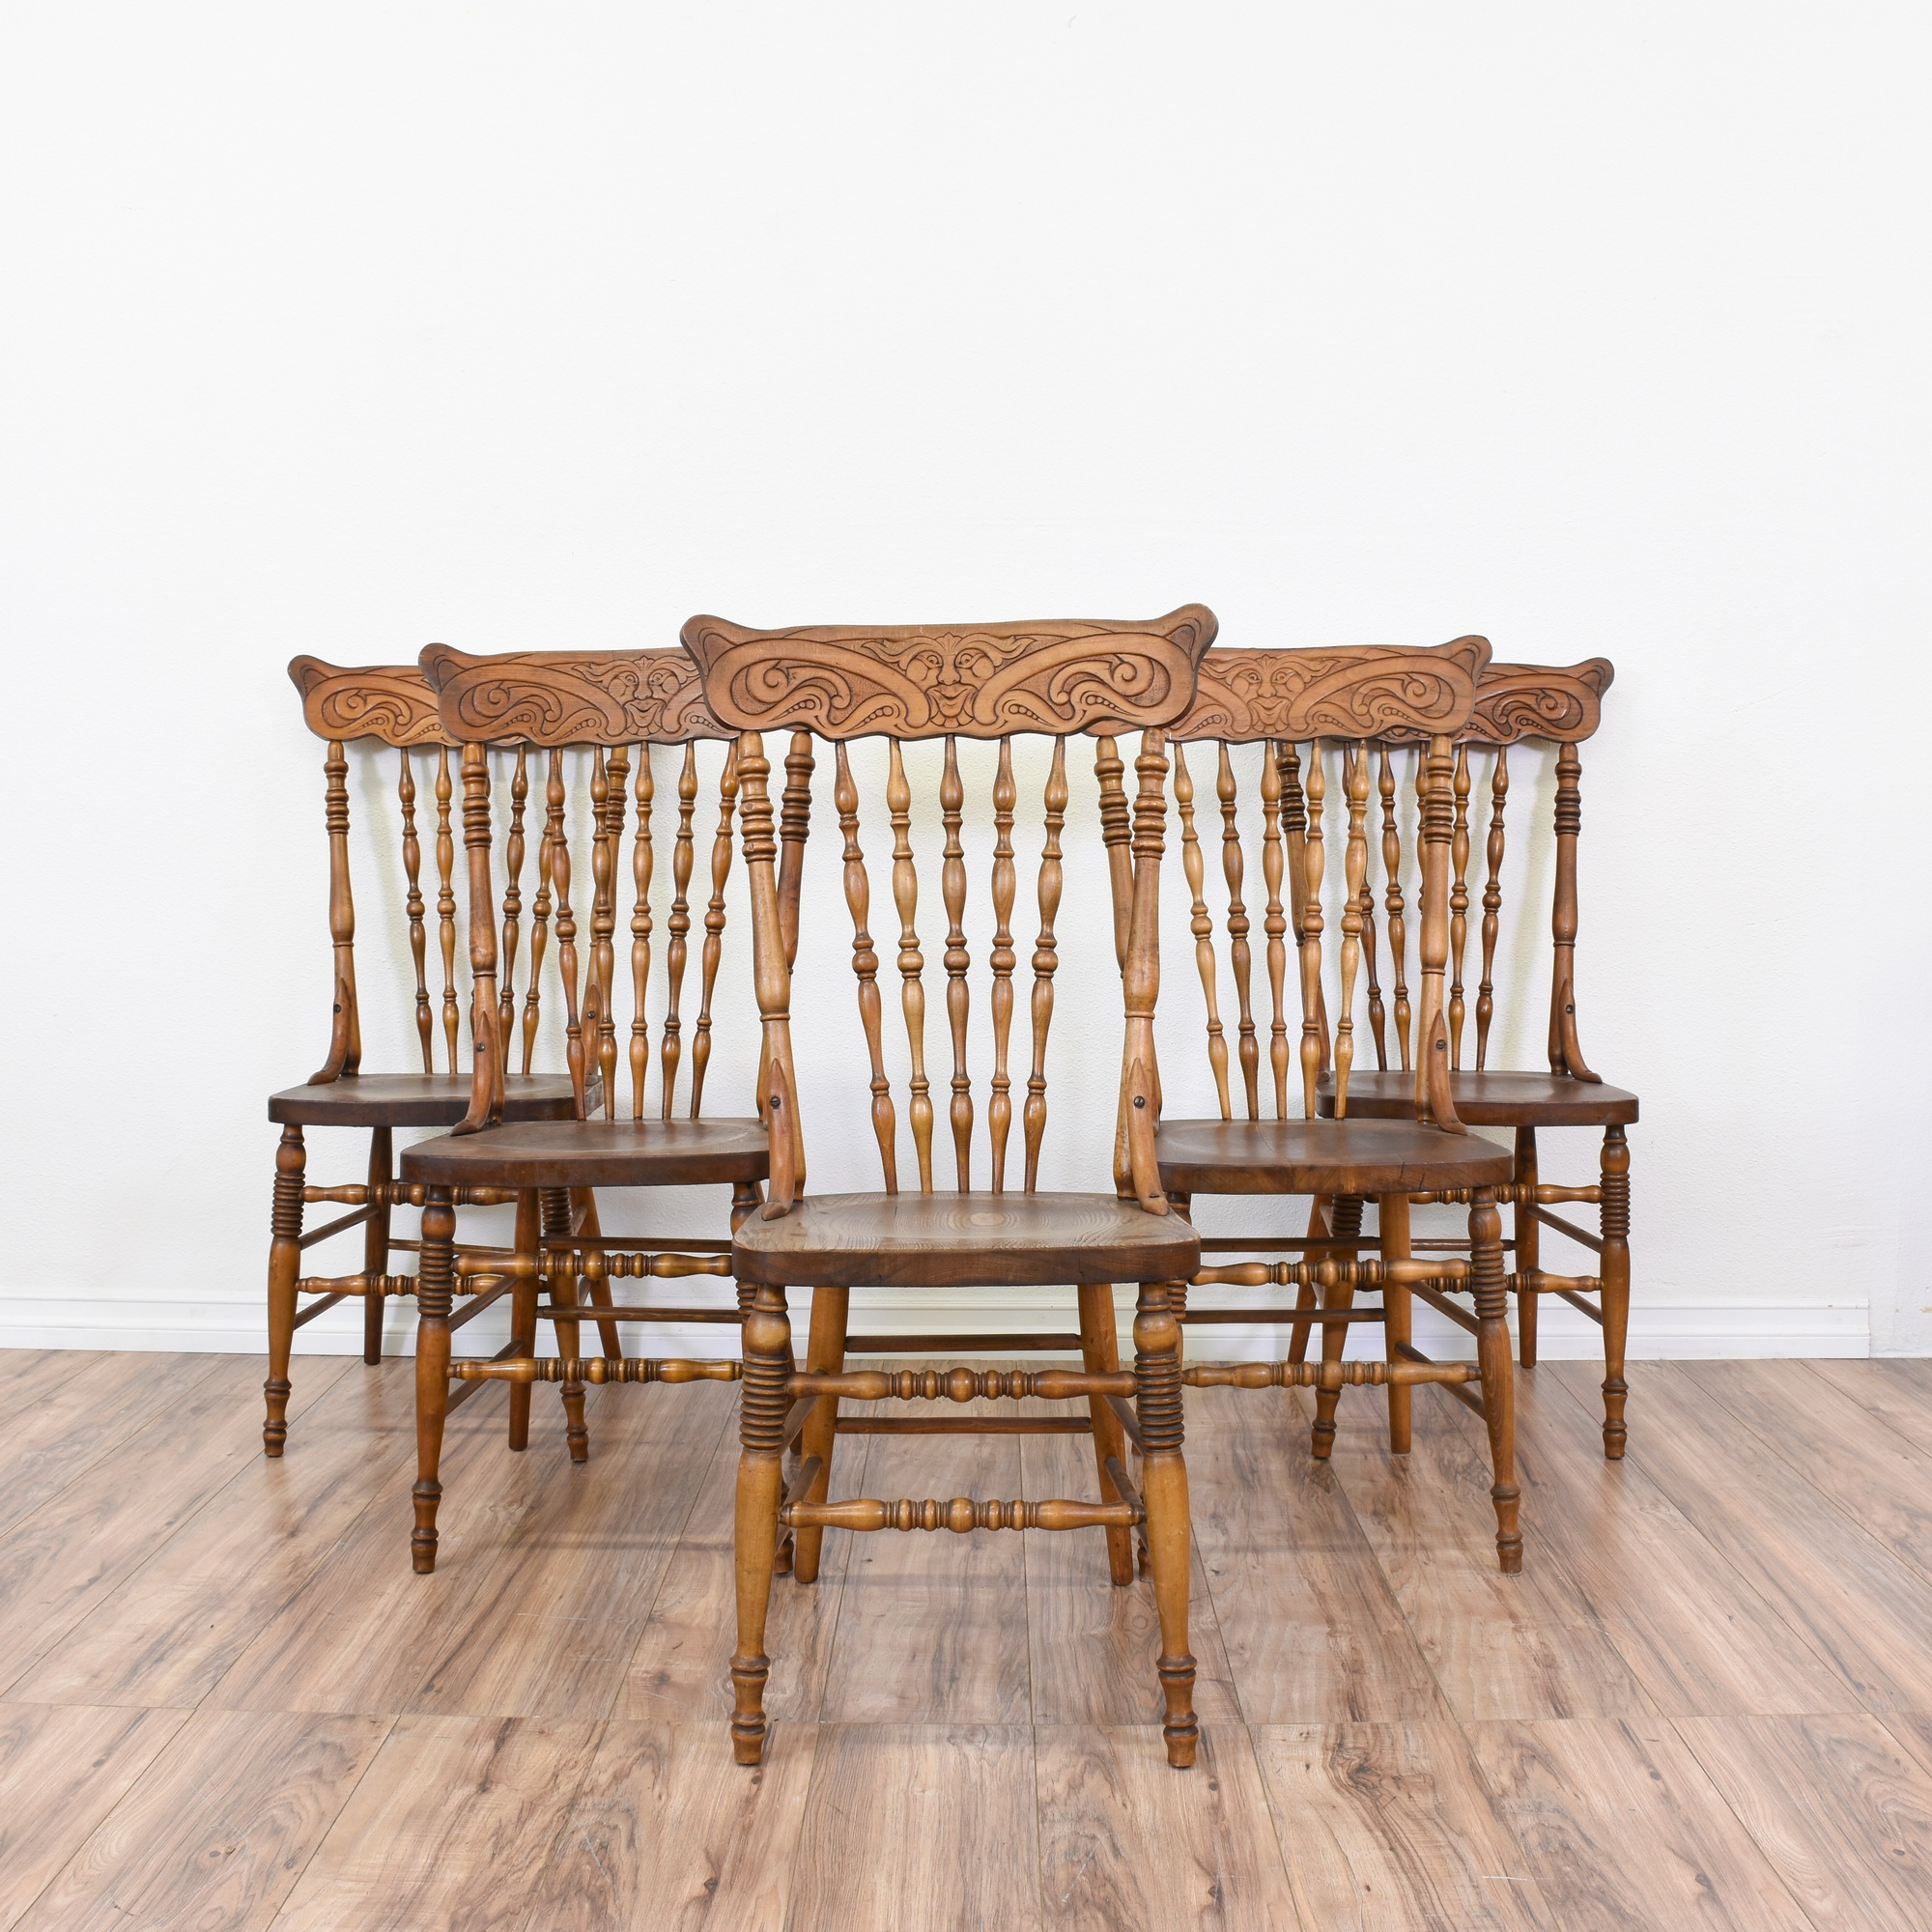 Set Of 5 Antique Carved Spindle Back Dining Chairs   Loveseat Vintage  Furniture San Diego